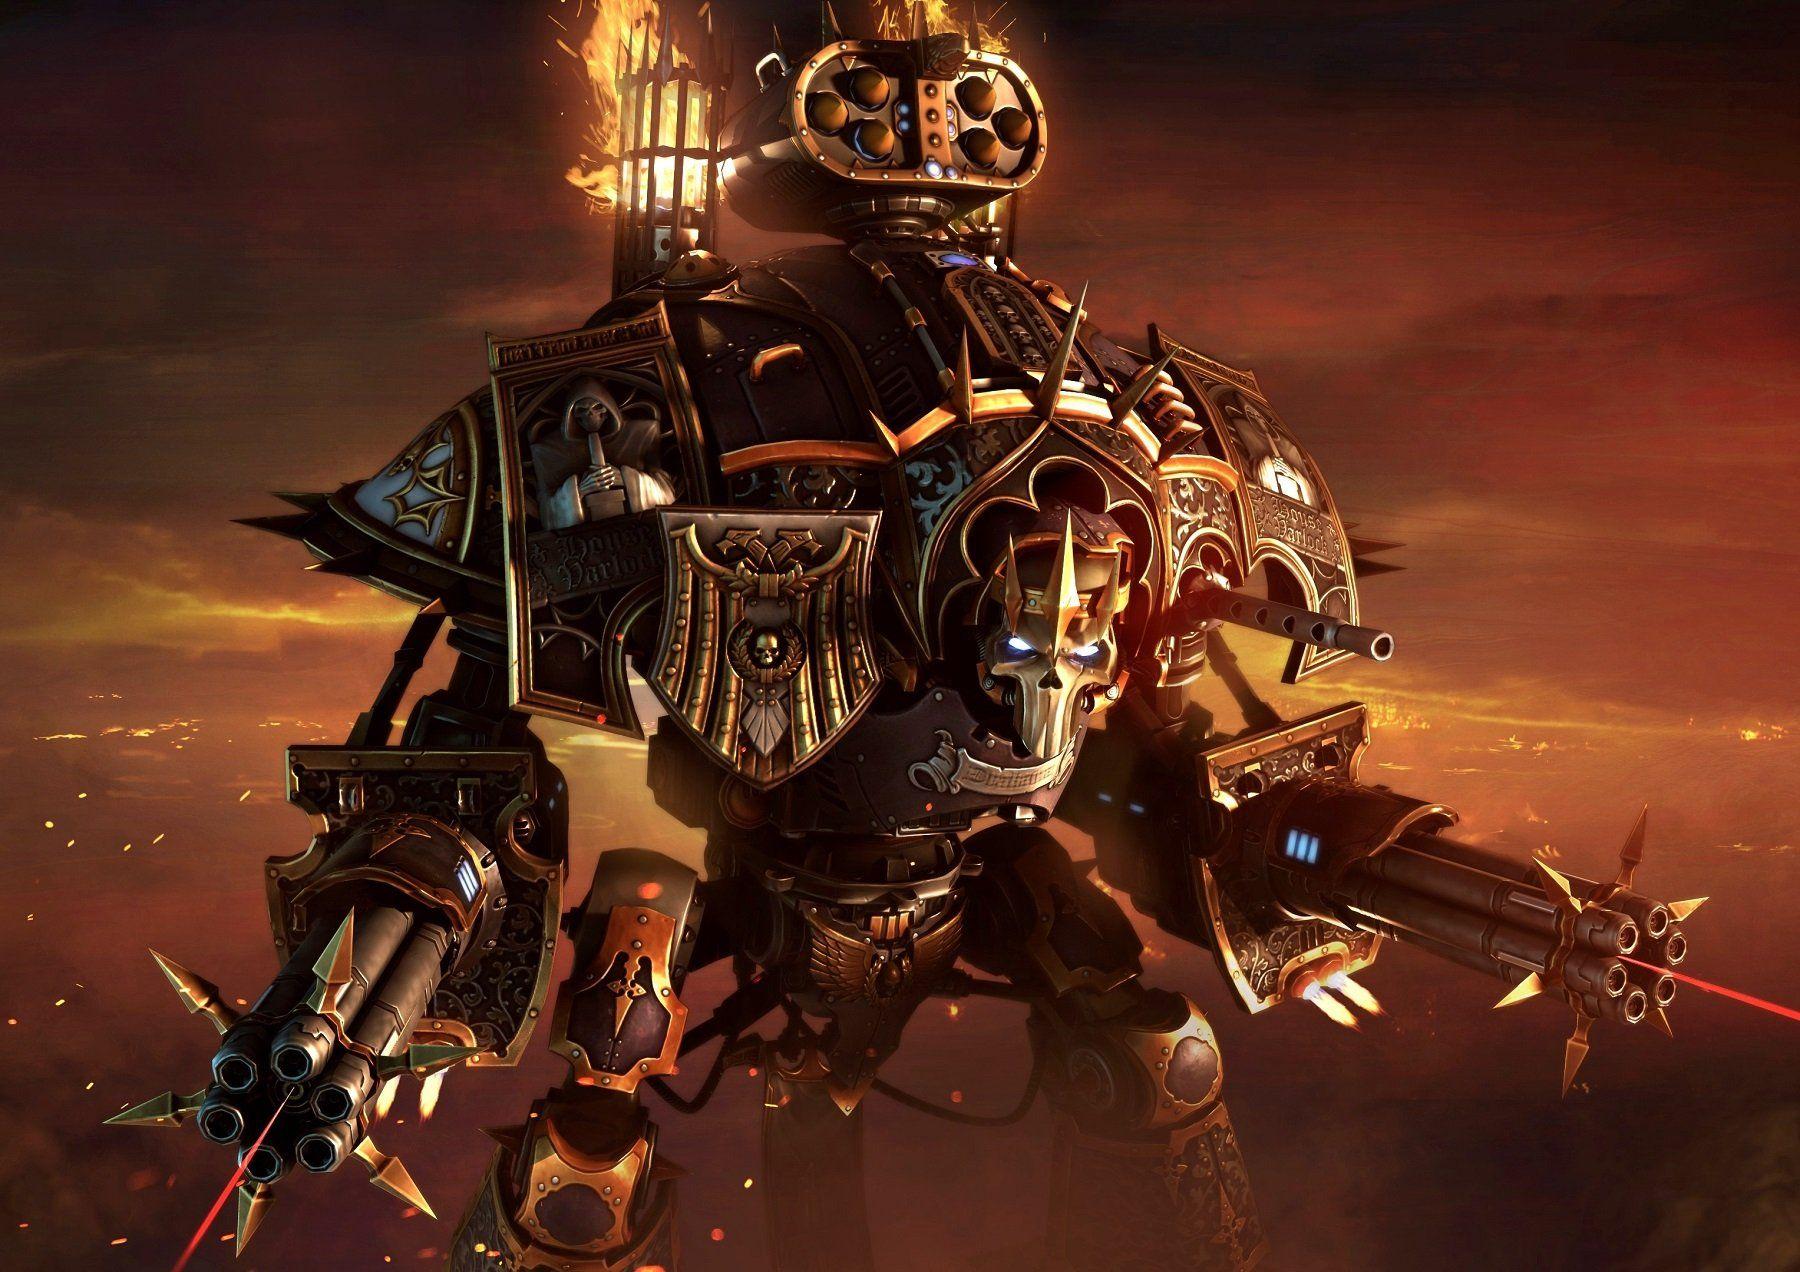 Warhammer 40,000 Dawn of War III Poster Warhammer 40k